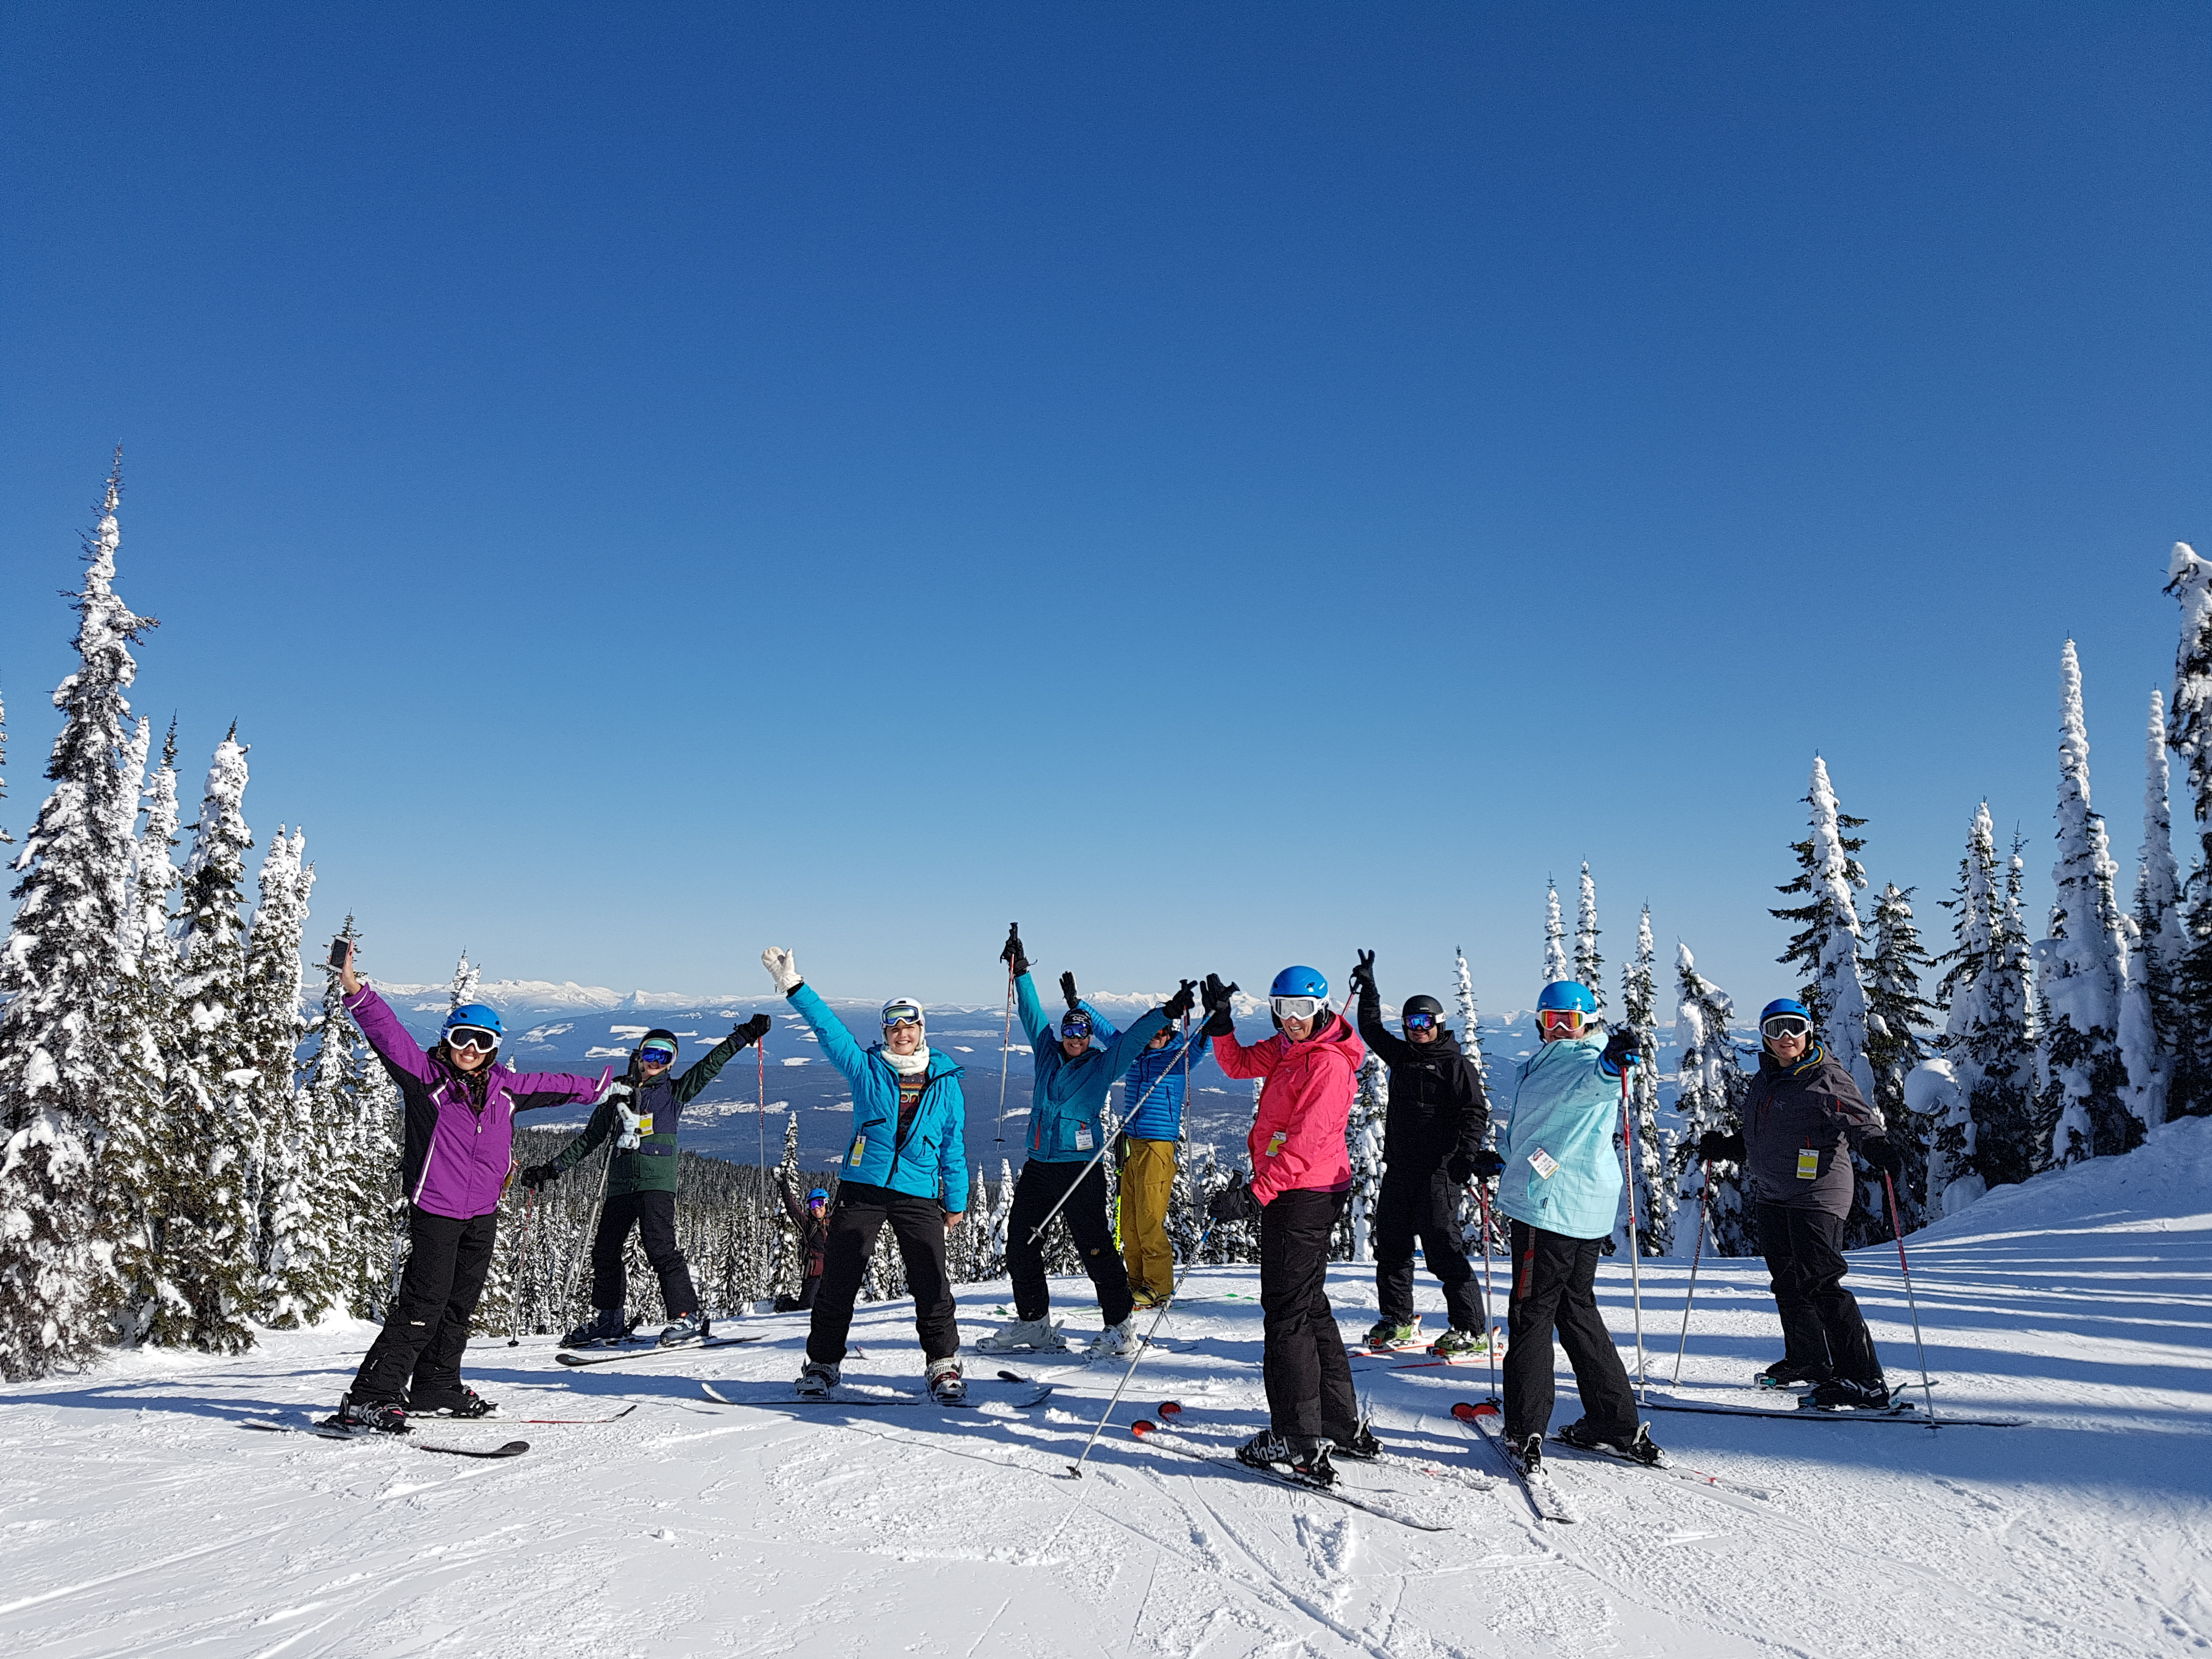 Group on slopes Mega 18 SS